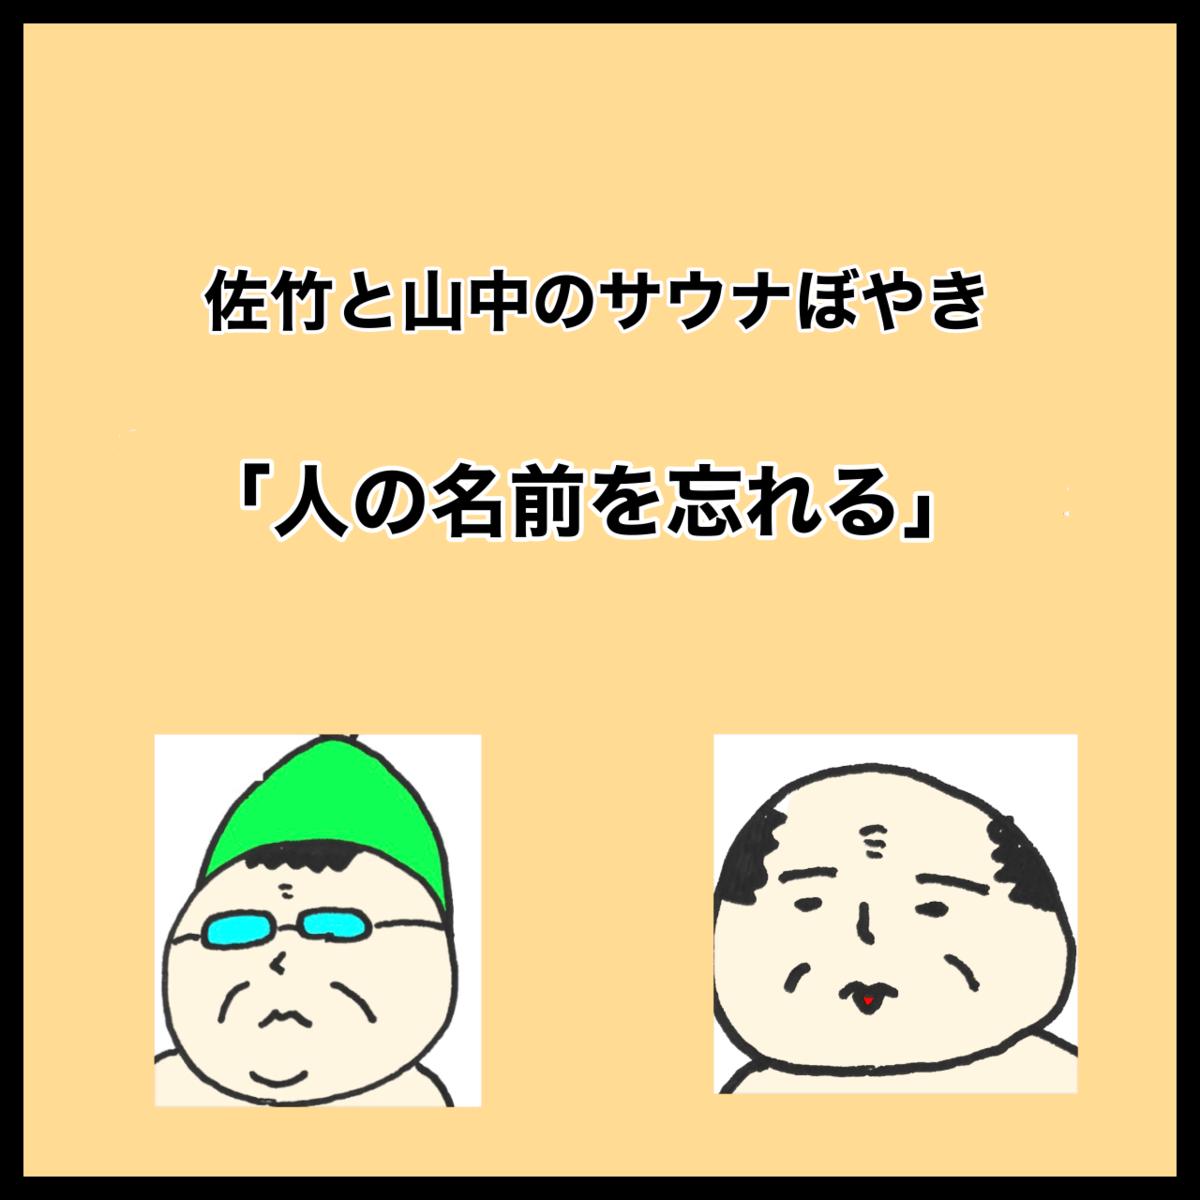 f:id:kinoko1629:20211014231551p:plain